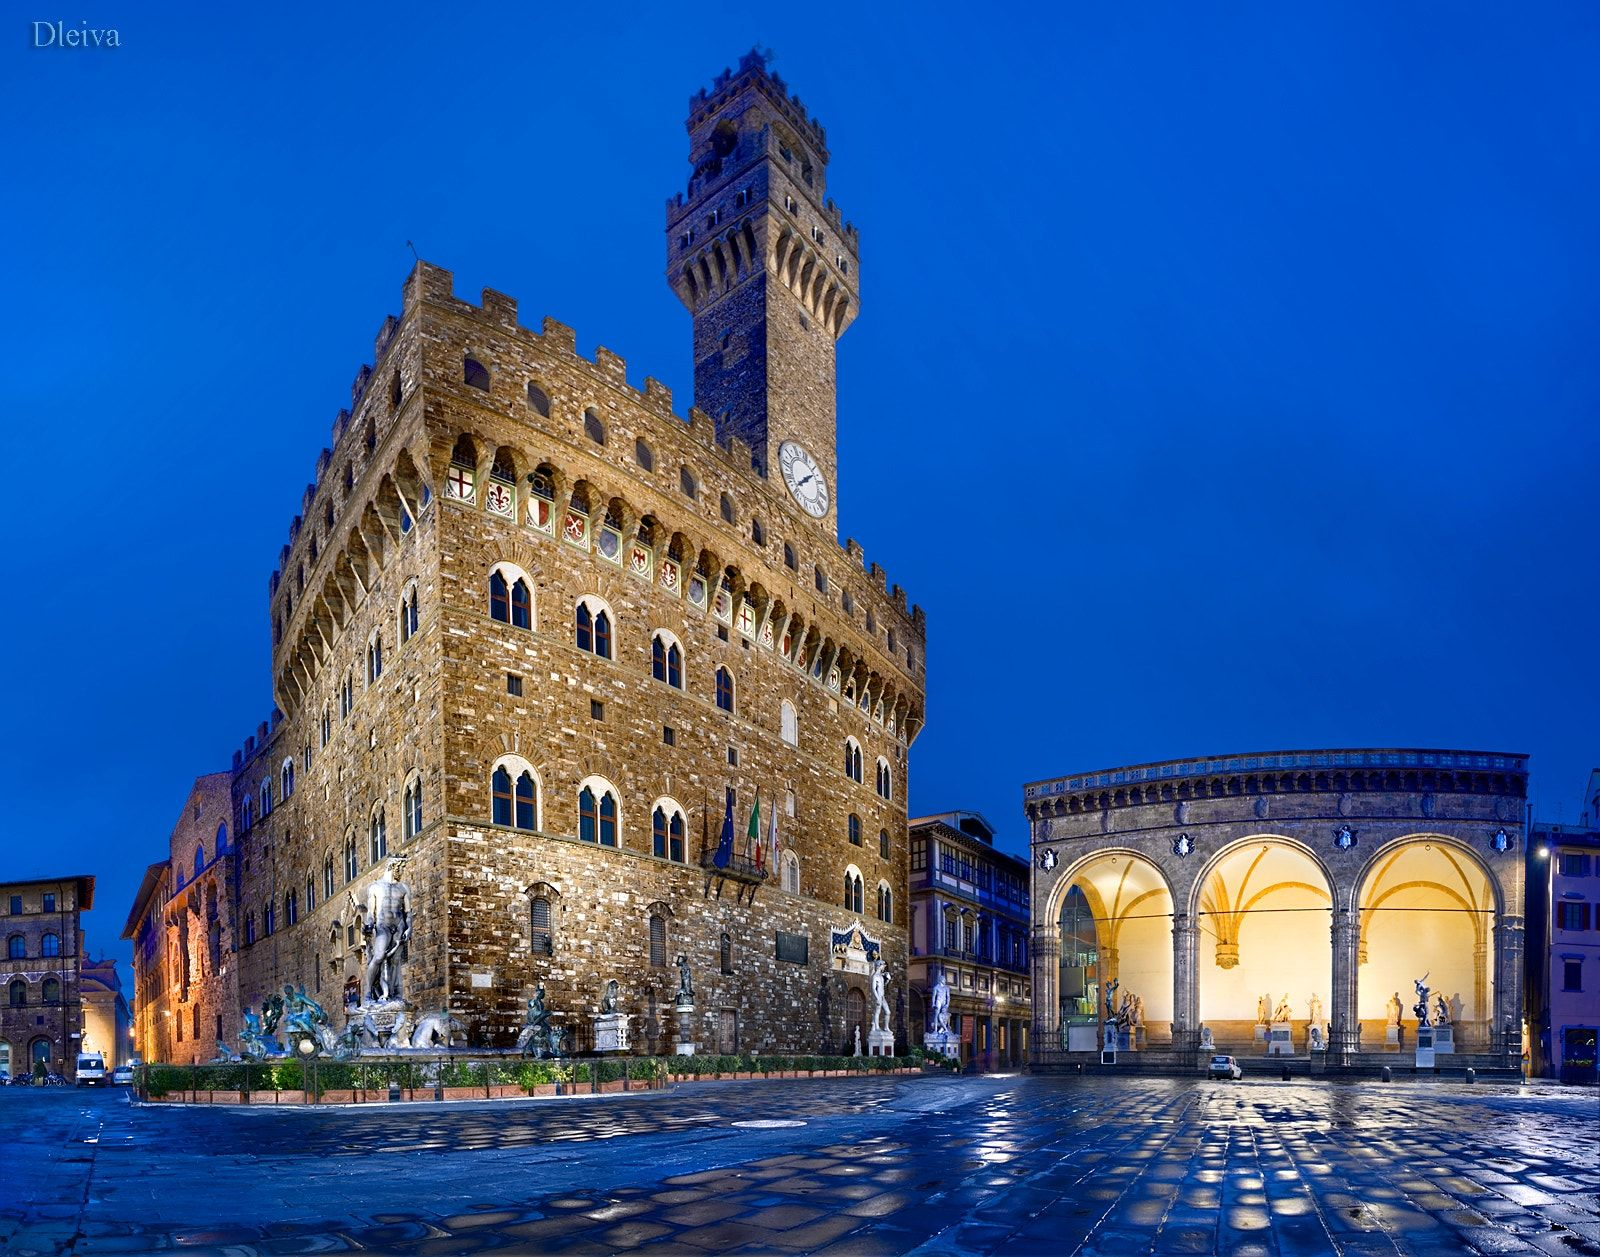 "Piazza Della Signoria,Palazzo Vecchio,Uffizi Museu - <a href=""http://www.flickr.com/photos/dleiva/sets/72157622555431937/show/"">to see my set Tuscany, Click here</a>"